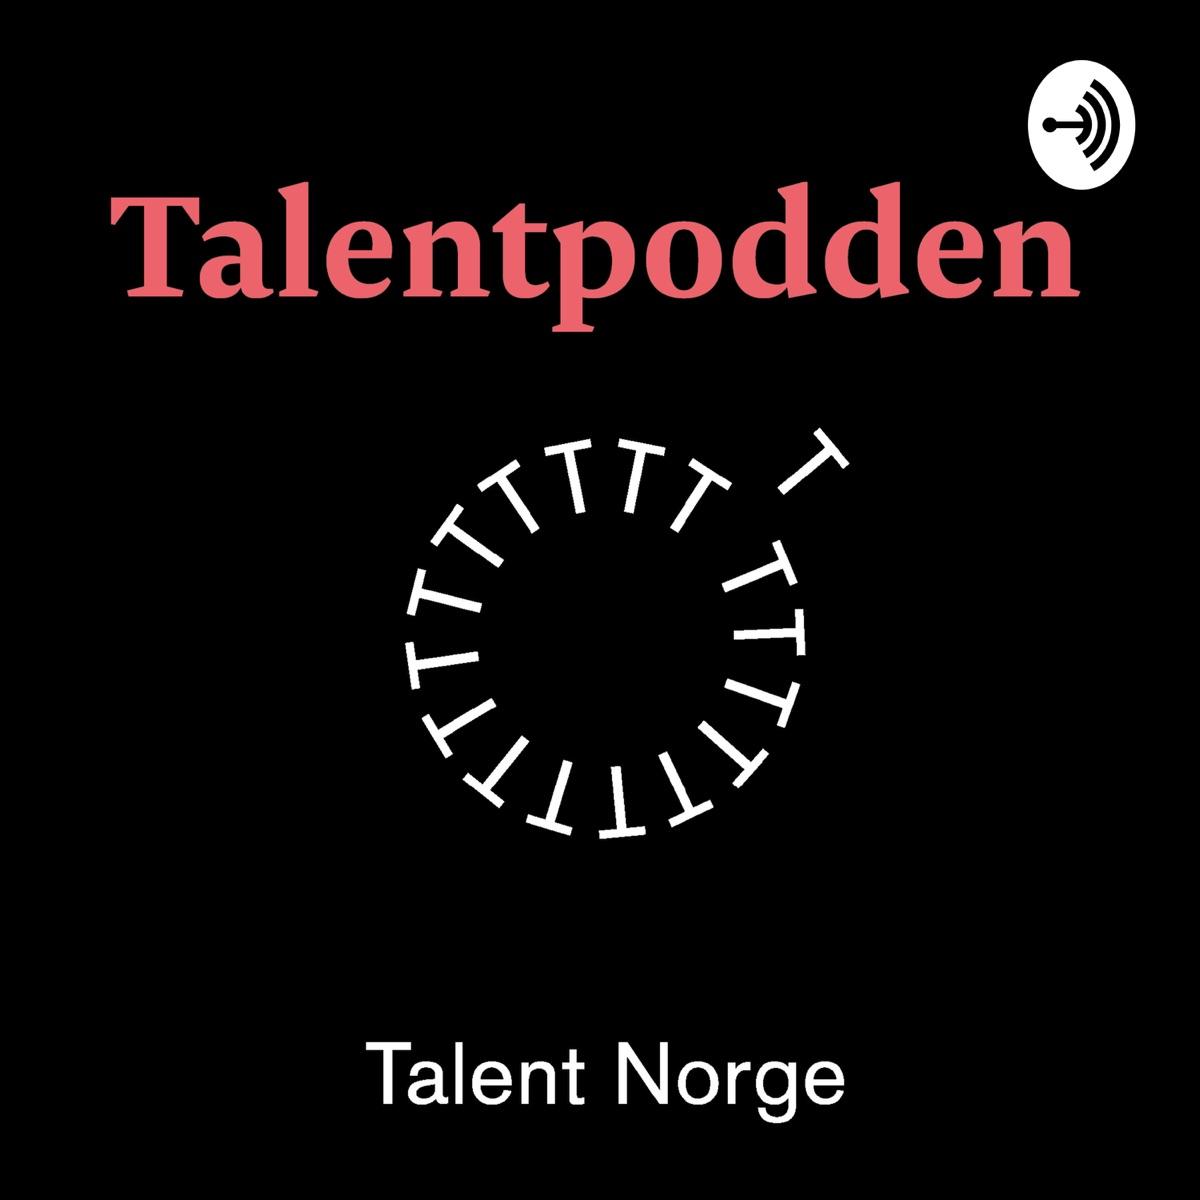 Talentpodden